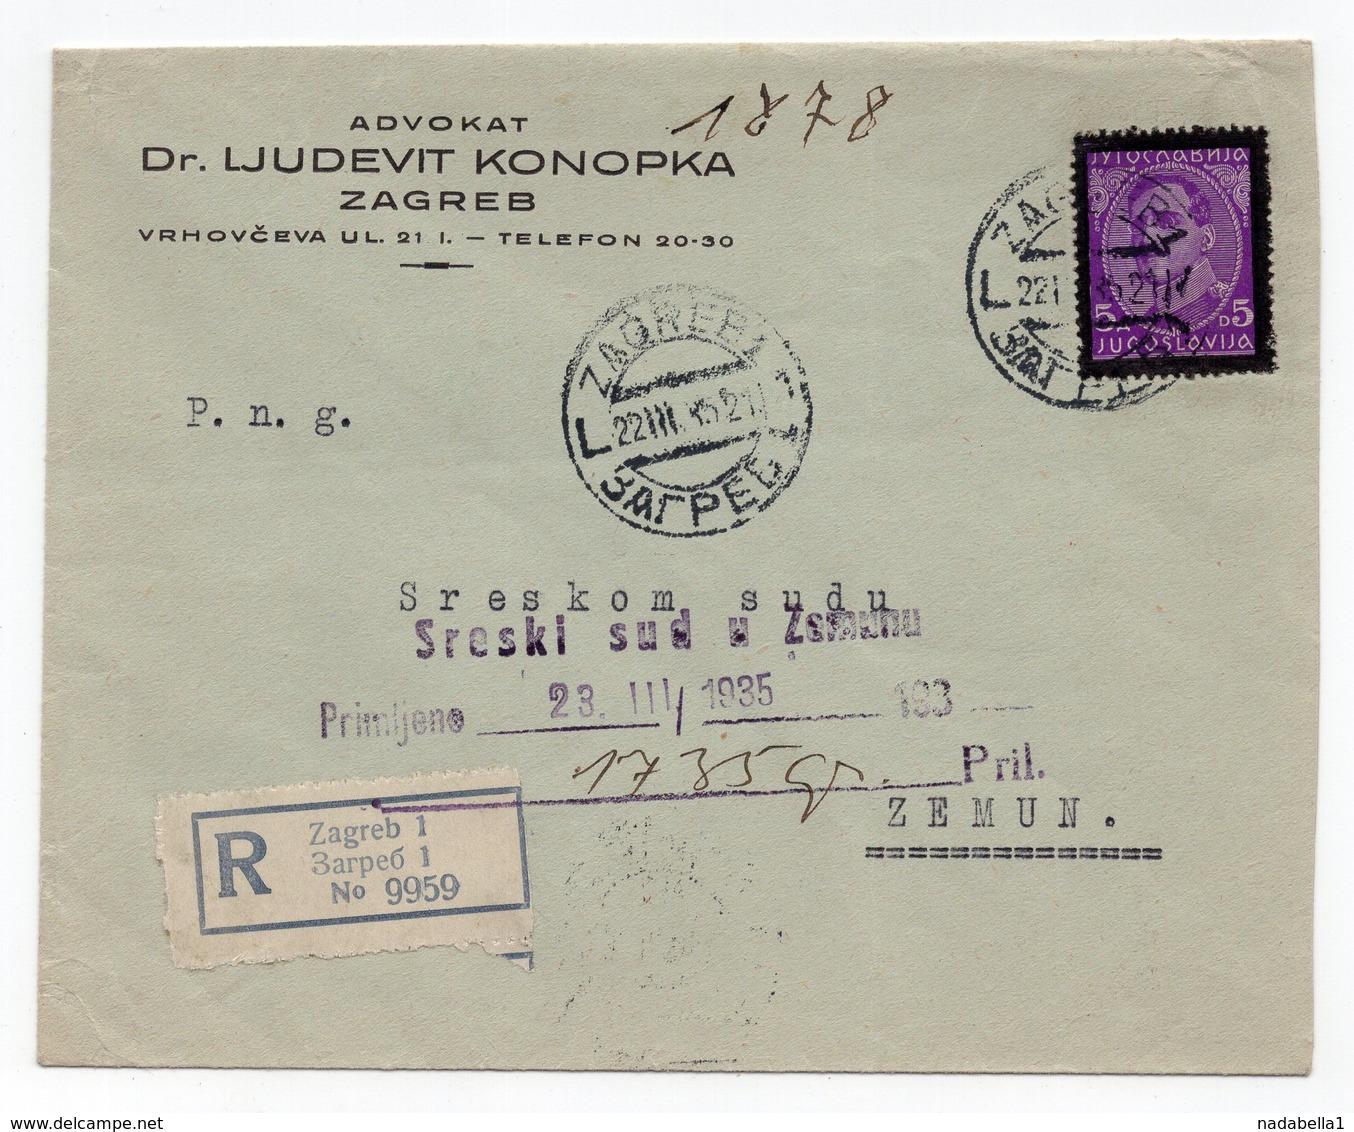 1935 YUGOSLAVIA, CROATIA, ZAGREB TO ZEMUN, COMPANY LETTERHEAD COVER, LAWYER DR LJUDEVIT KONOPKA, REGISTERED MAIL - 1931-1941 Kingdom Of Yugoslavia